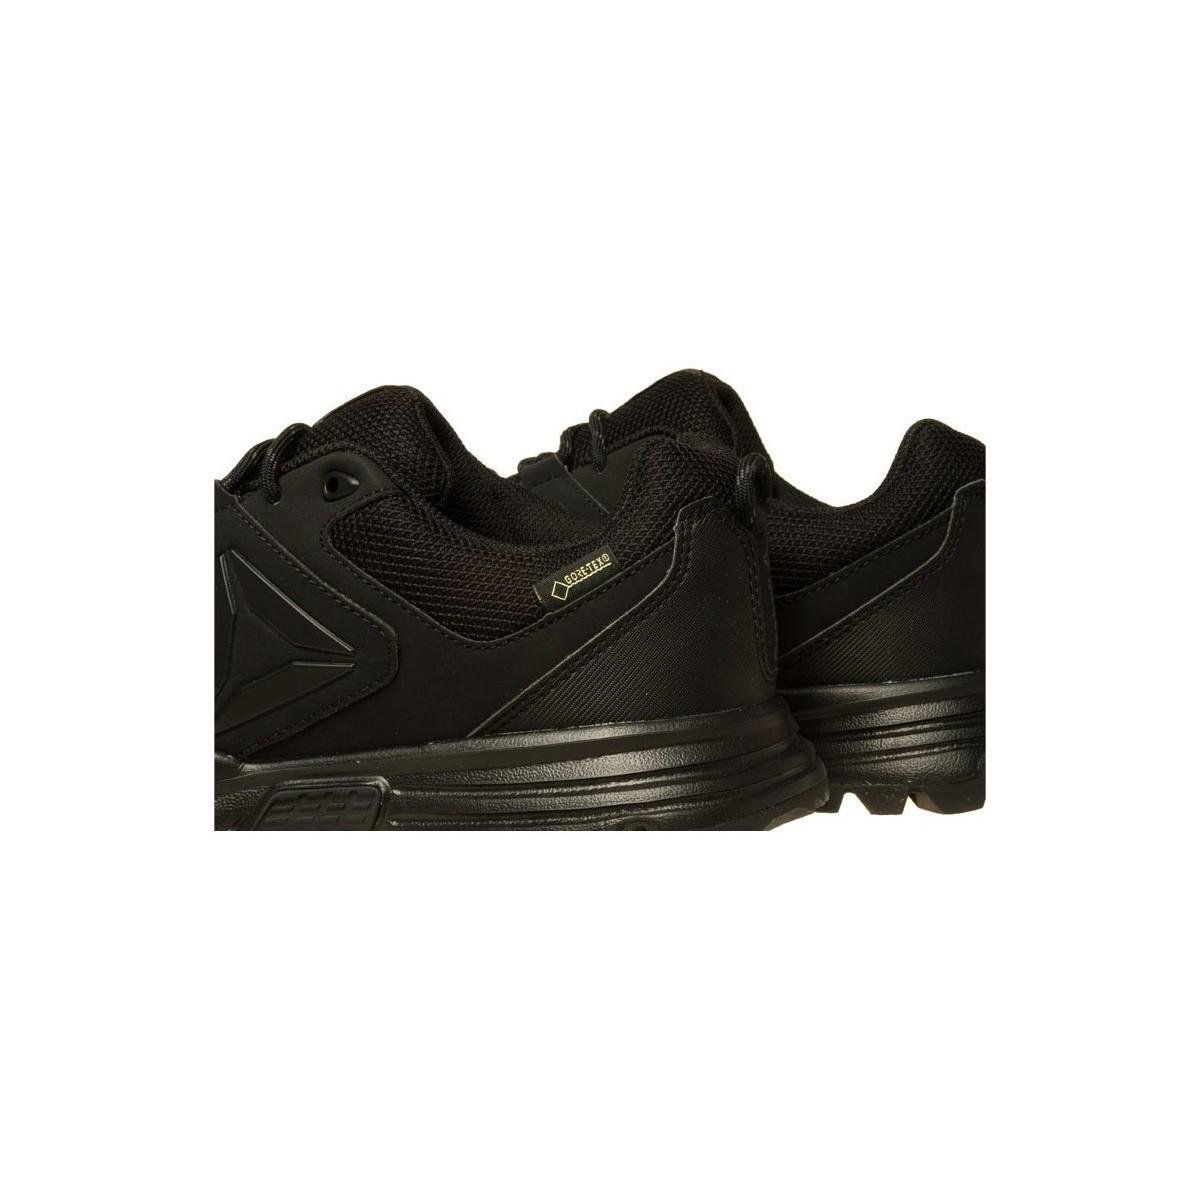 Reebok 0 G Men's Running Trainers In Black for Men